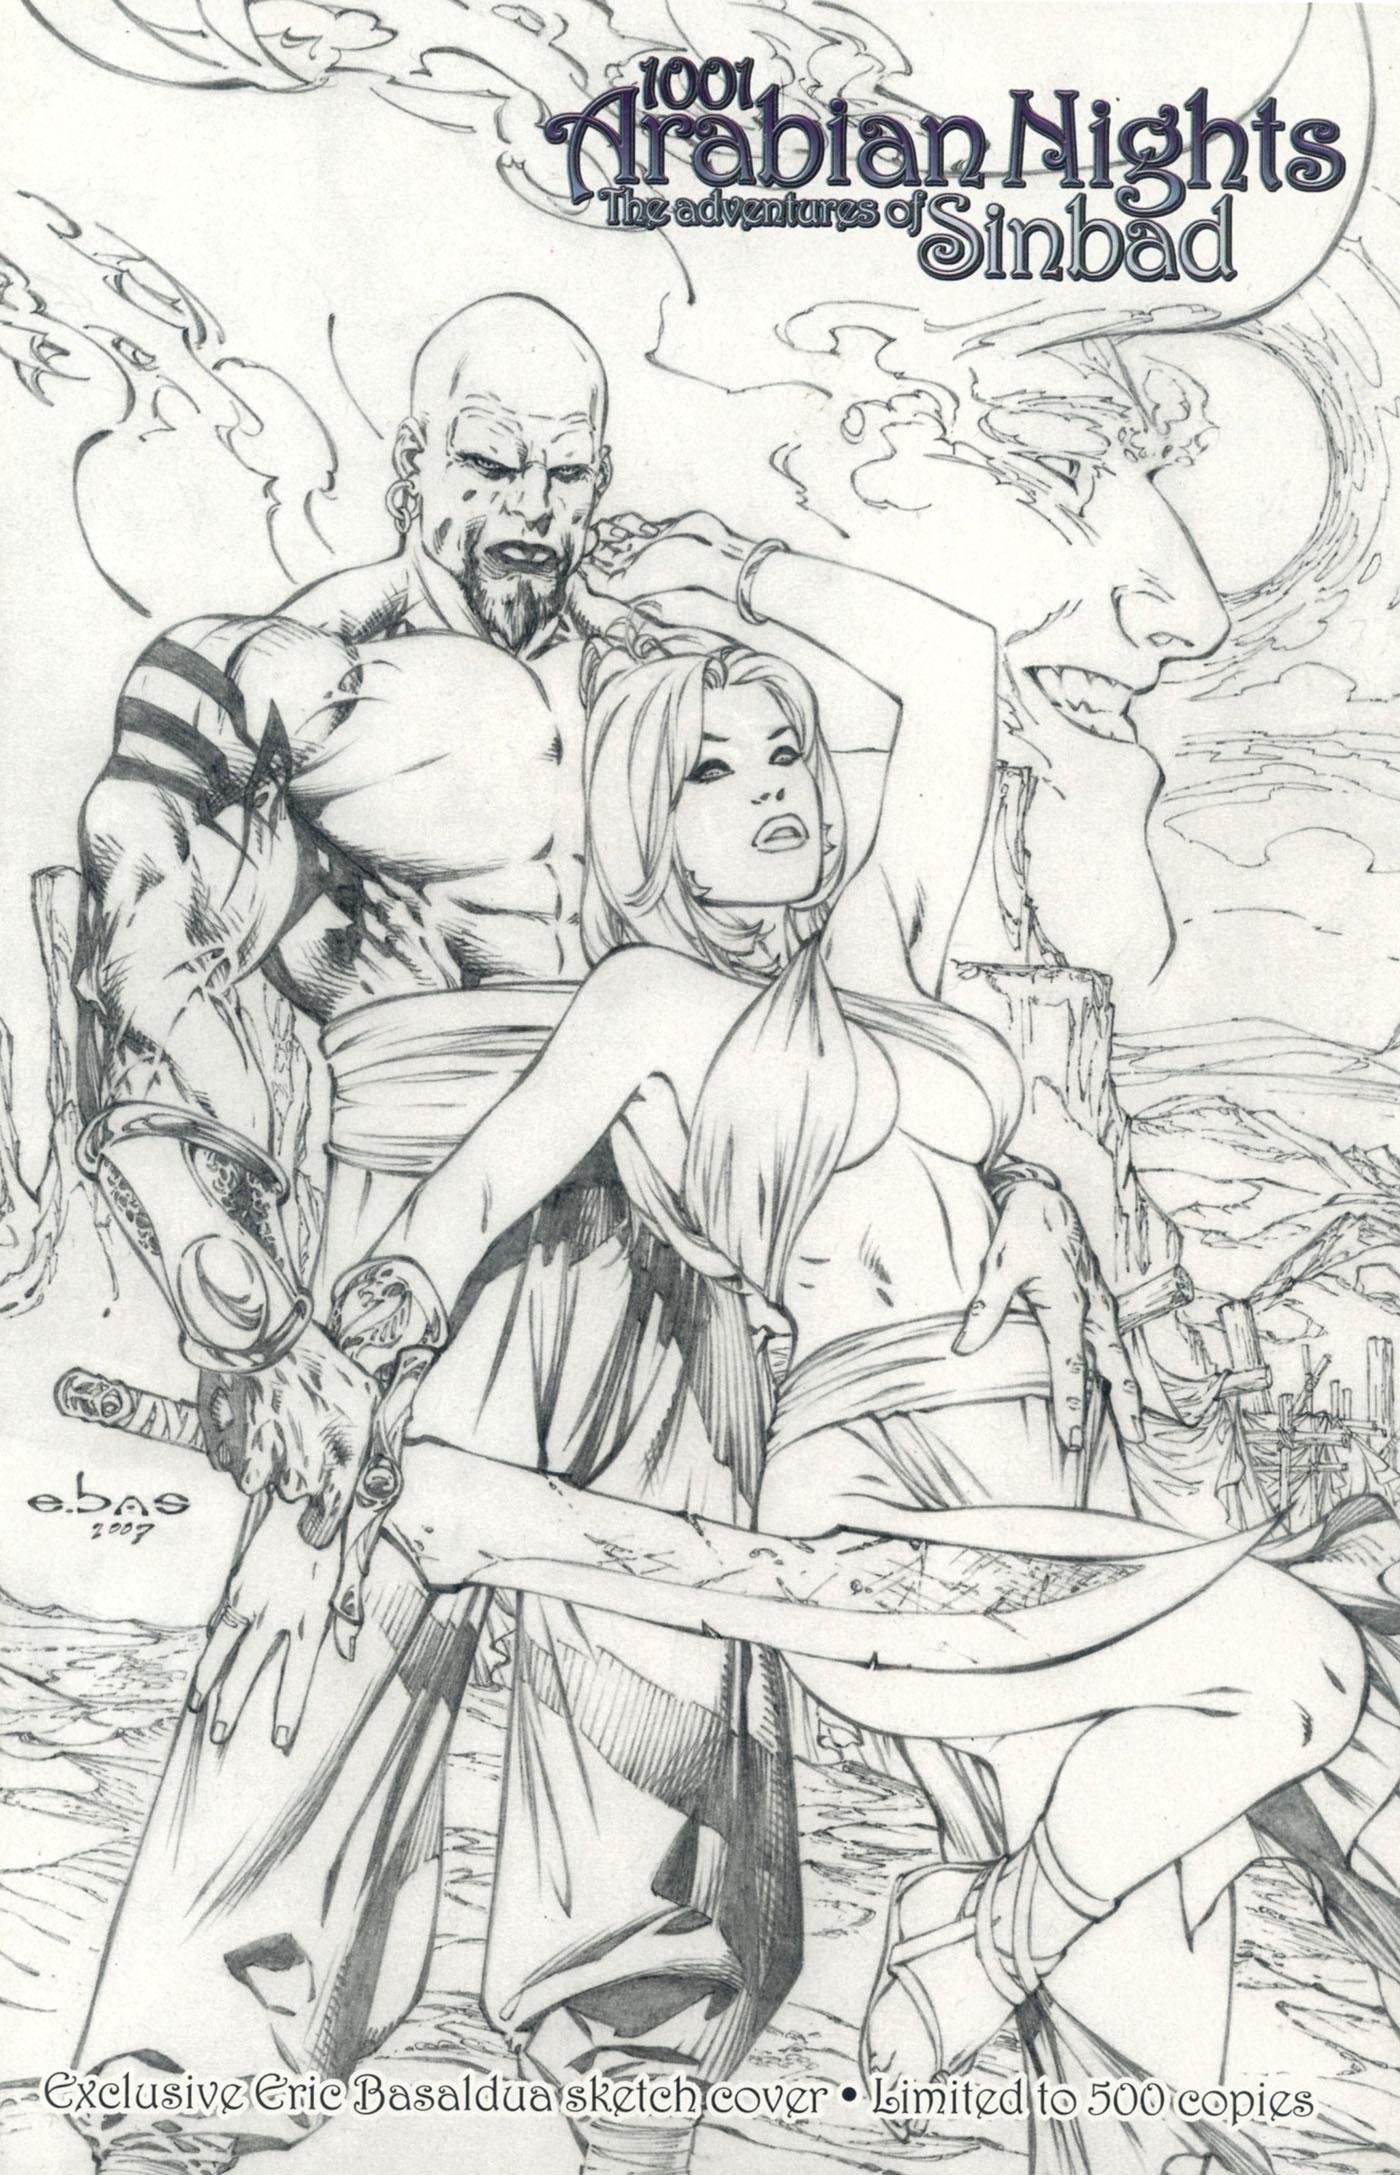 Read online 1001 Arabian Nights: The Adventures of Sinbad comic -  Issue #1 - 4